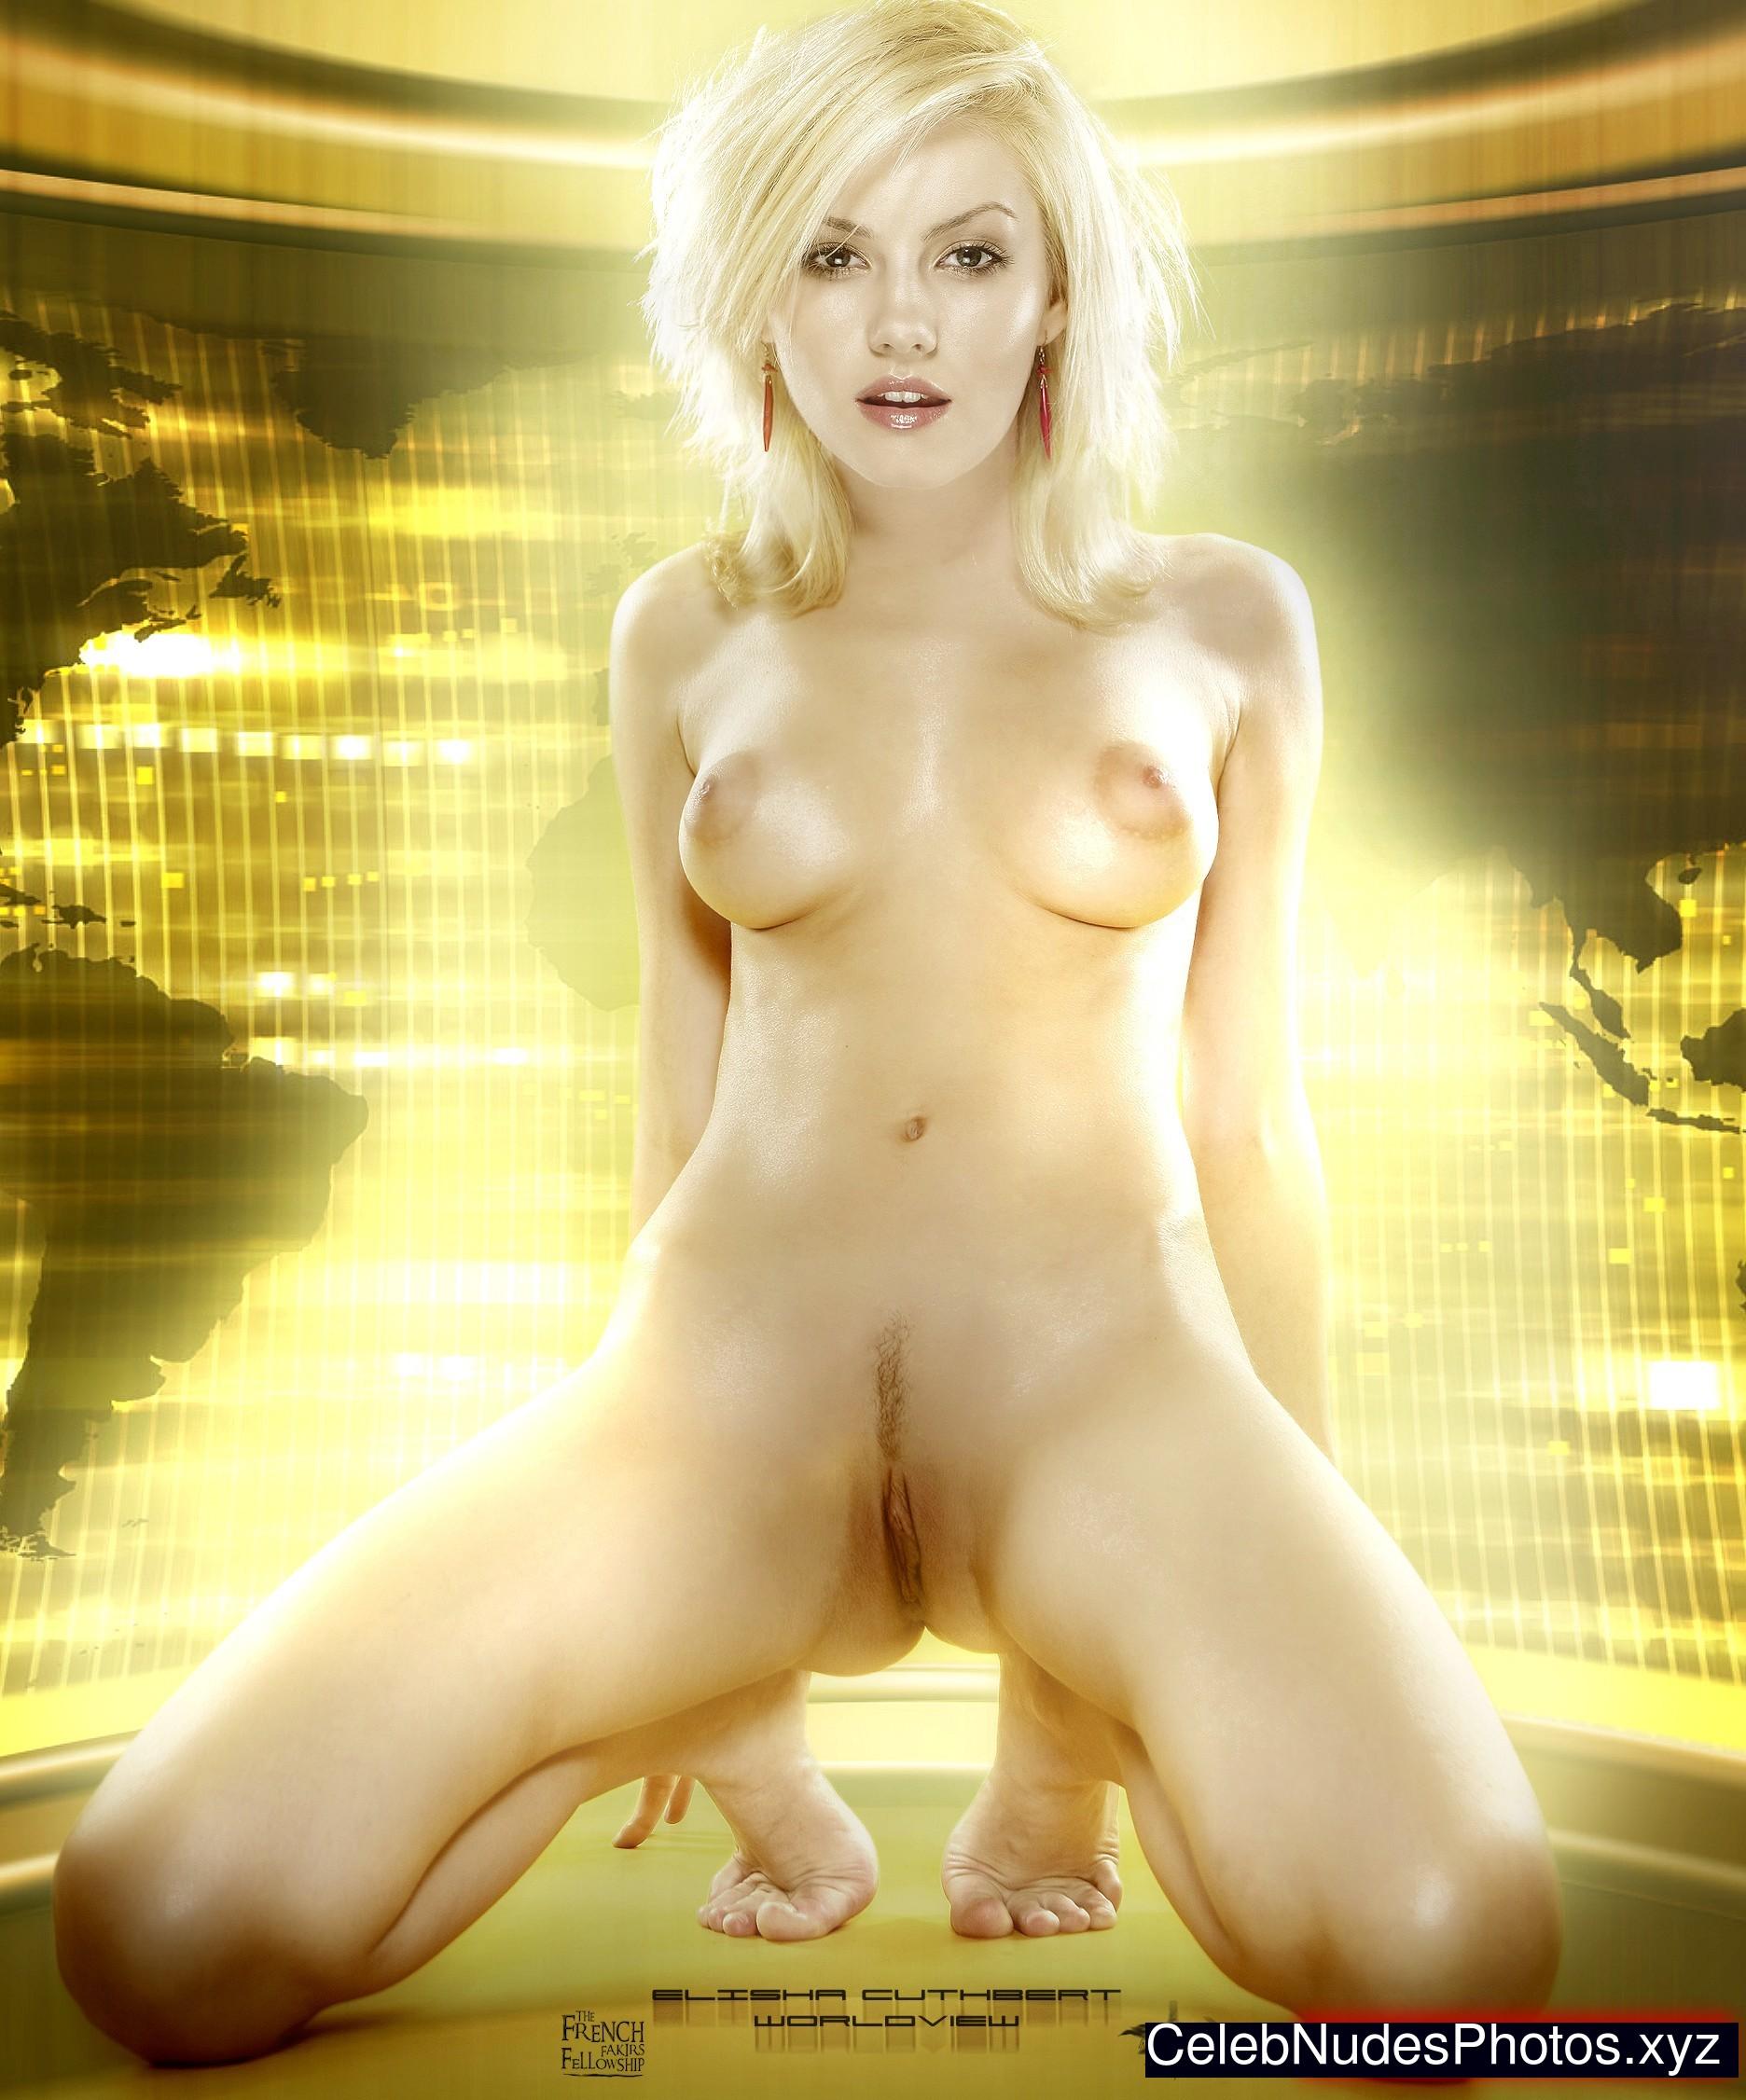 Commit error. Celebrity nude elisha cuthbert consider, what